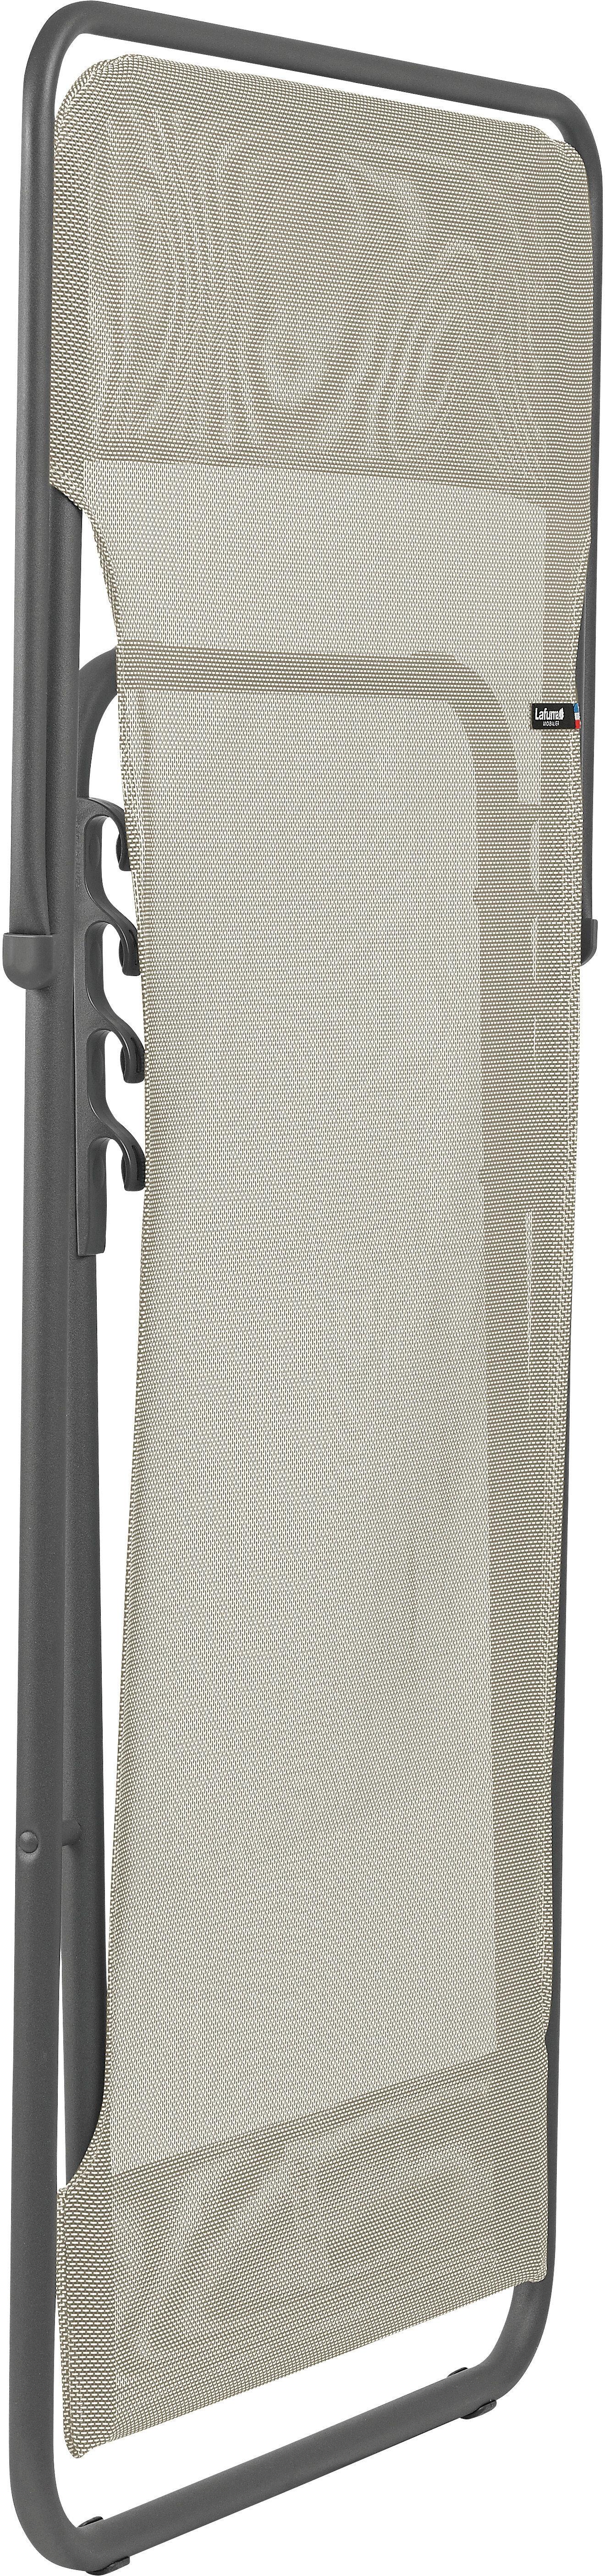 lafuma mobilier maxi transat liegestuhl batyline seigle. Black Bedroom Furniture Sets. Home Design Ideas